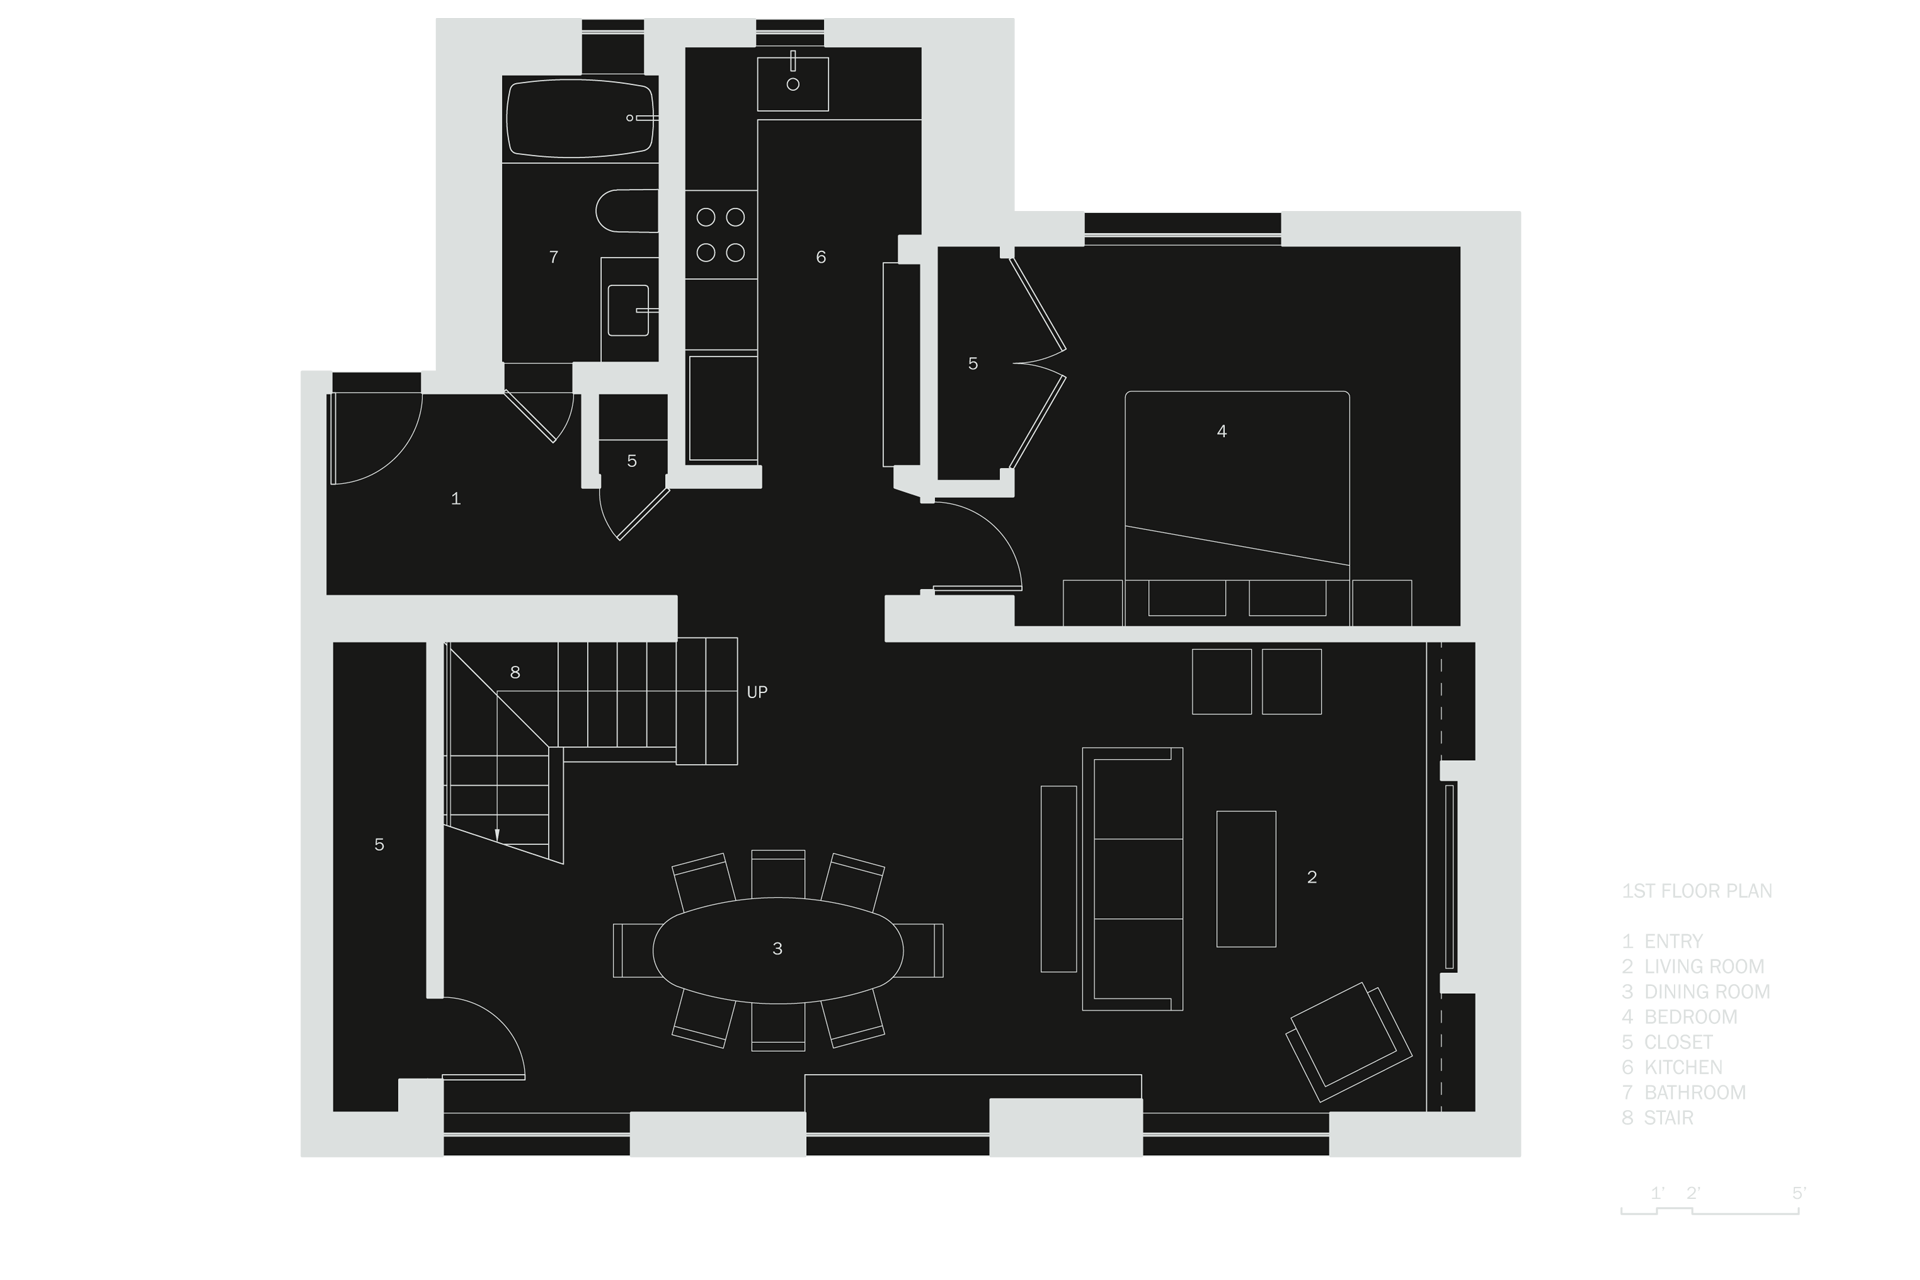 test floorplan